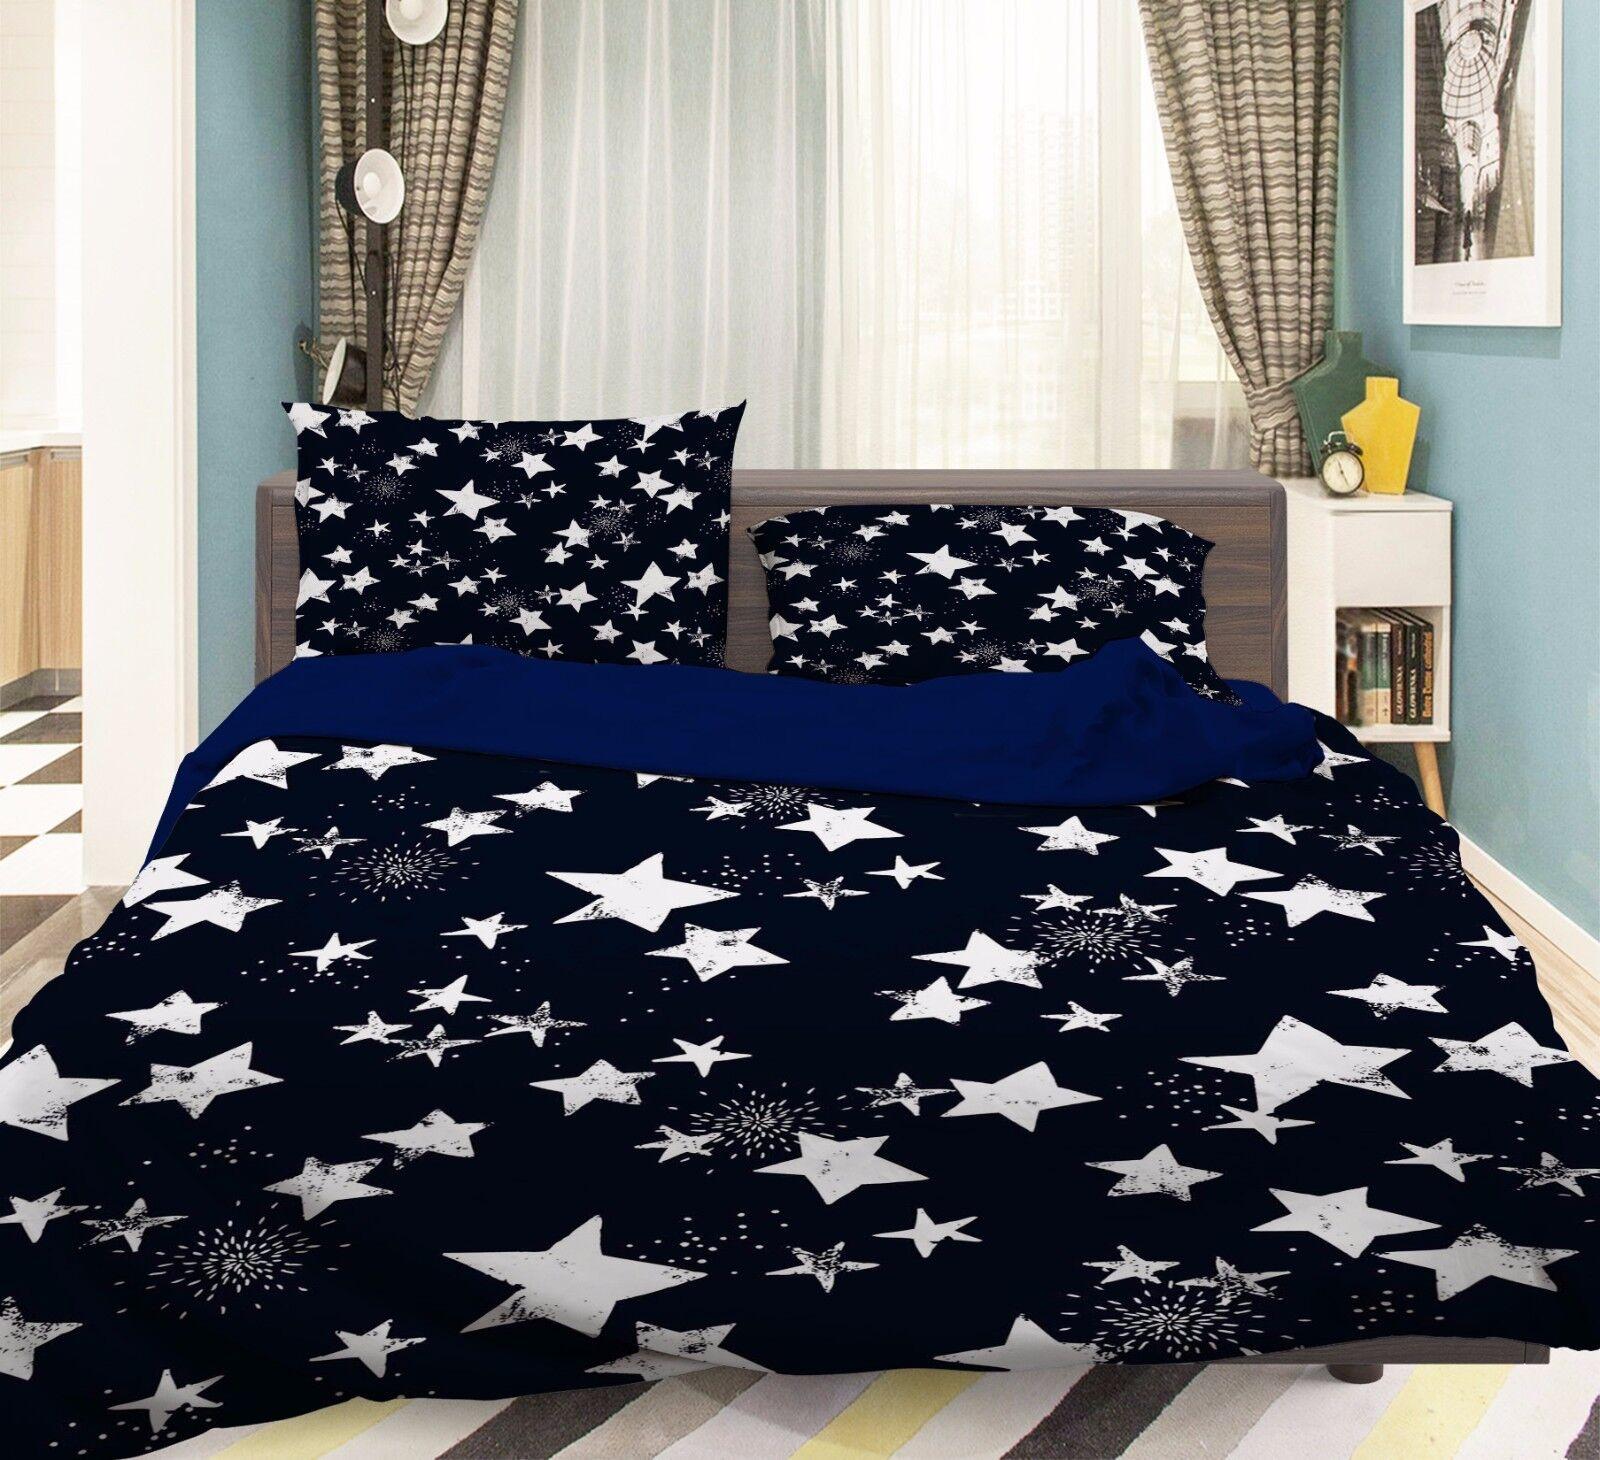 3D Dark color Stars 532 Bed Pillowcases Quilt Duvet Cover Set Single Queen CA